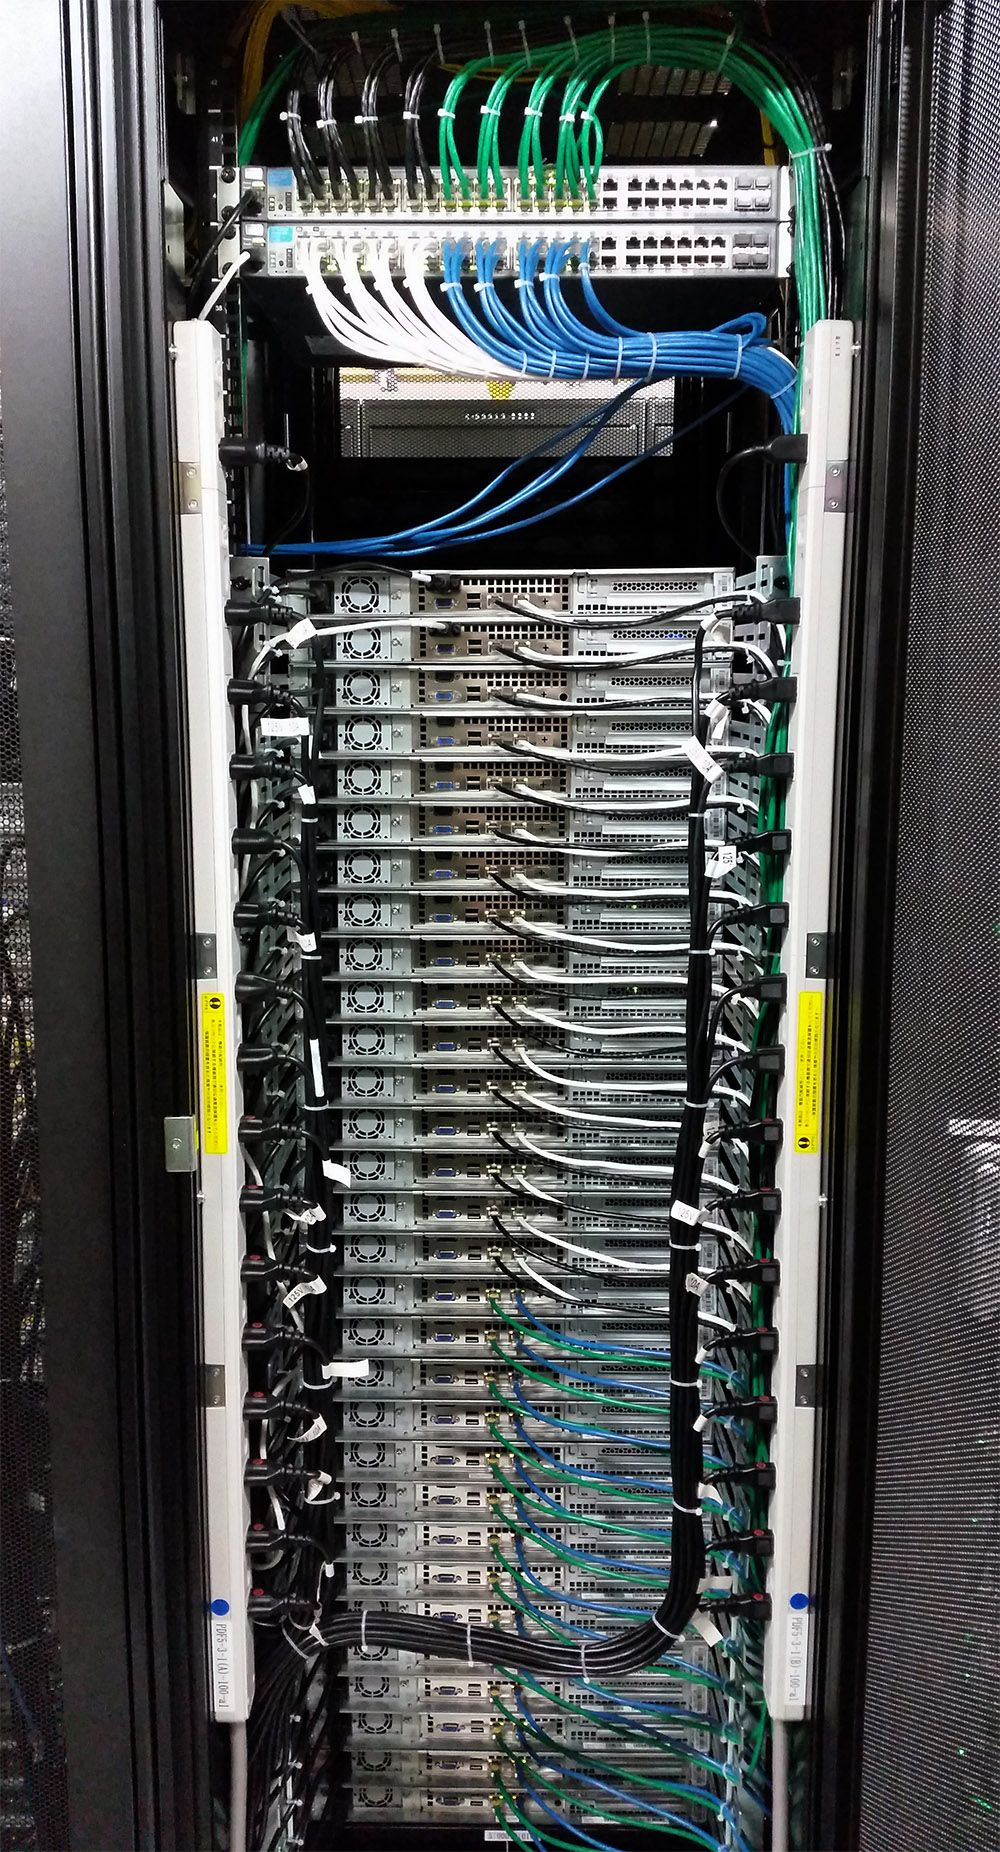 medium resolution of crazy server rack neatly done